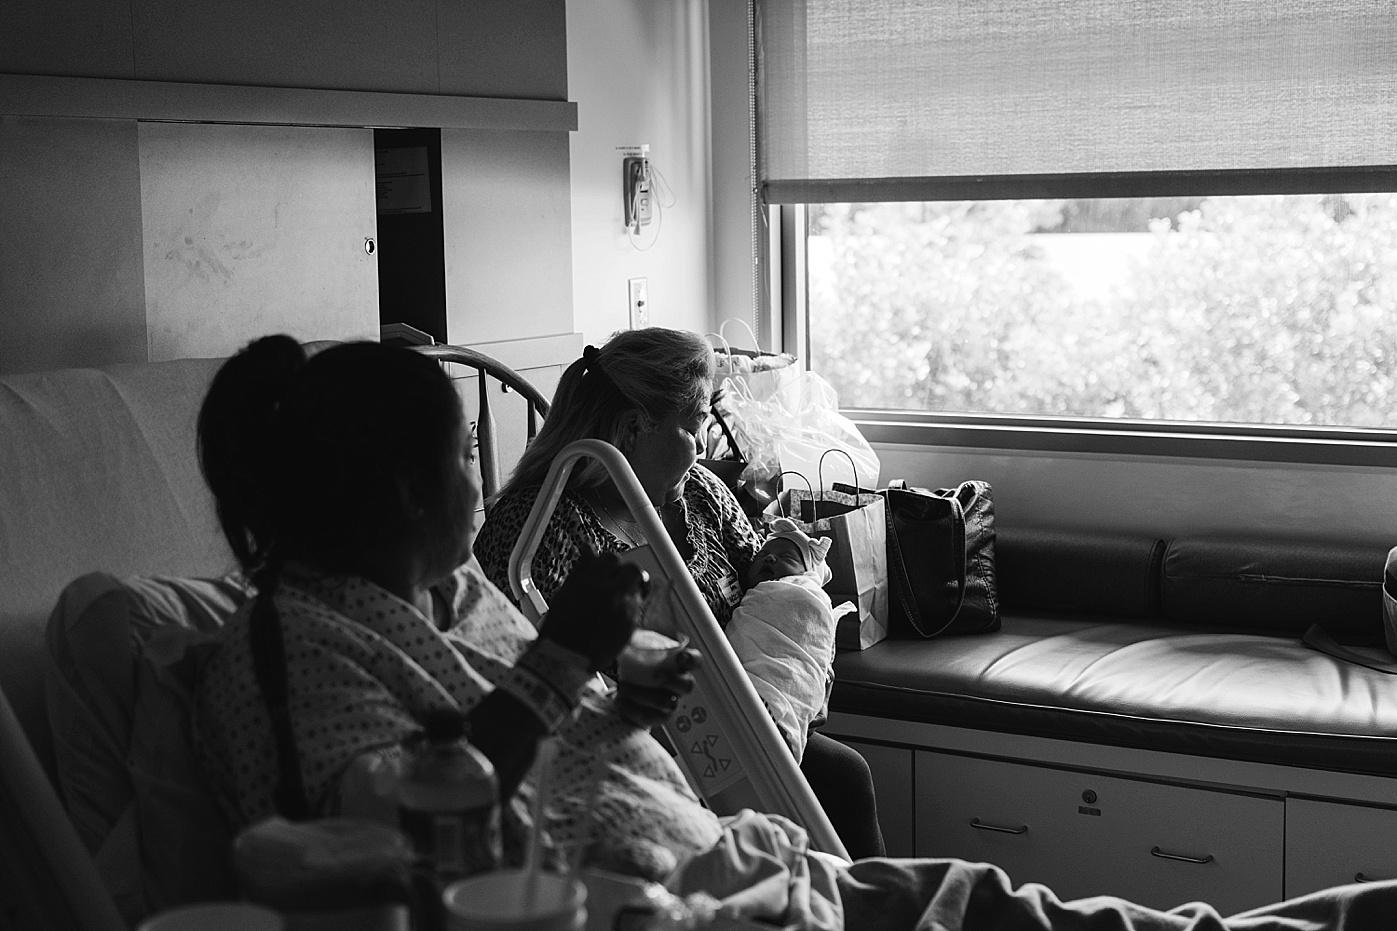 mom grandma and newborn baby girl in hospital